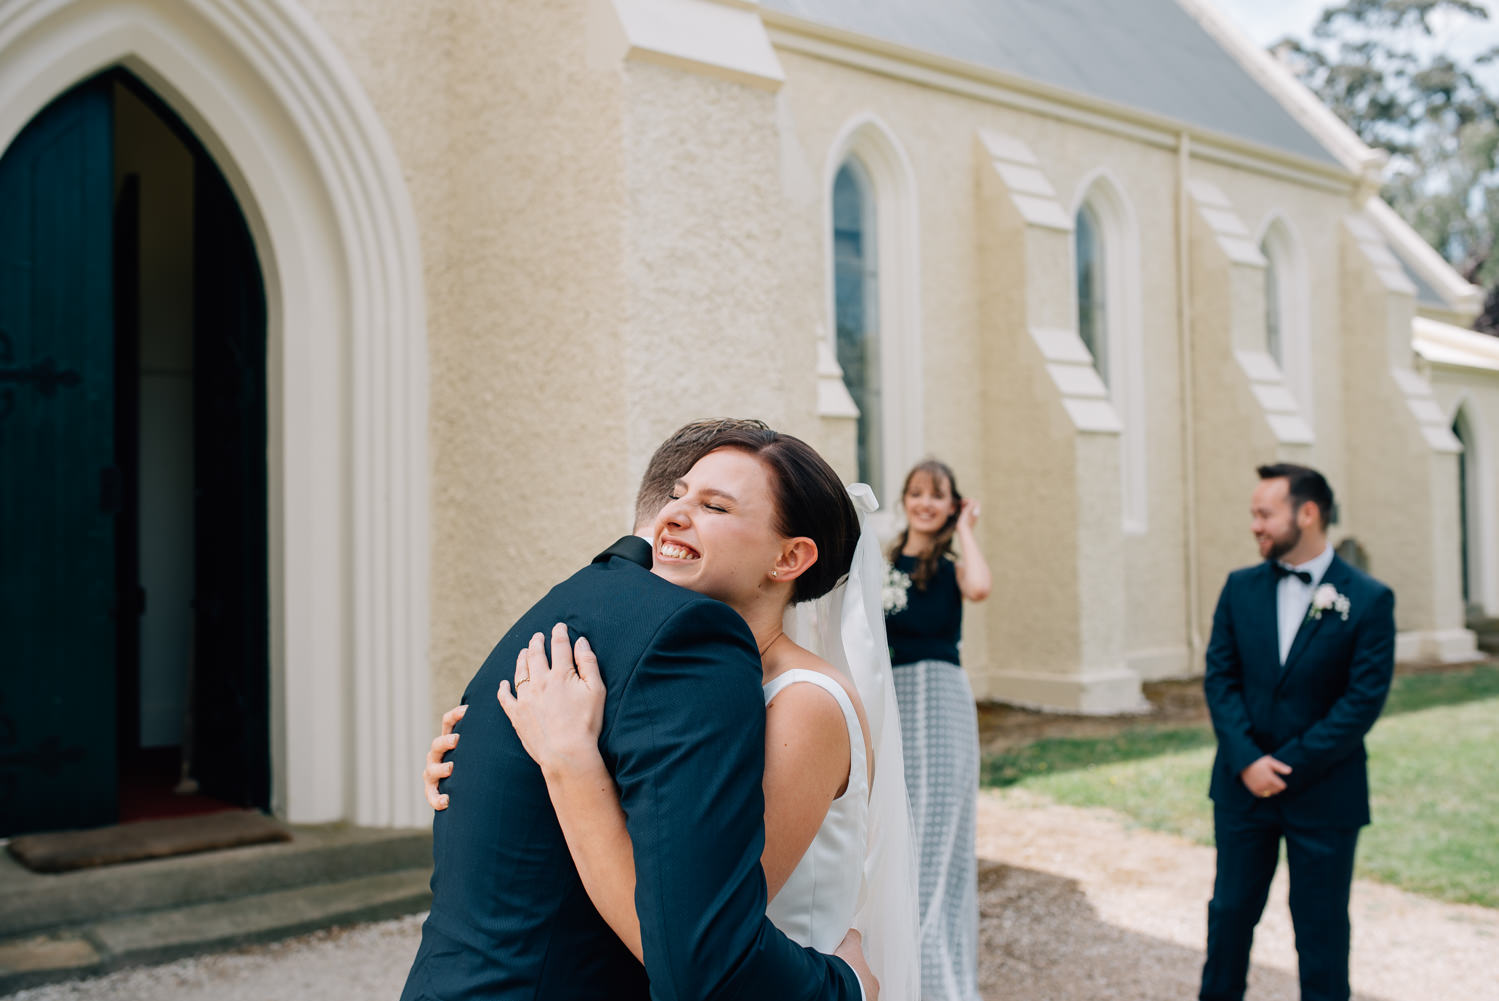 Josef-Chromy-Wedding-Photographer-40.jpg